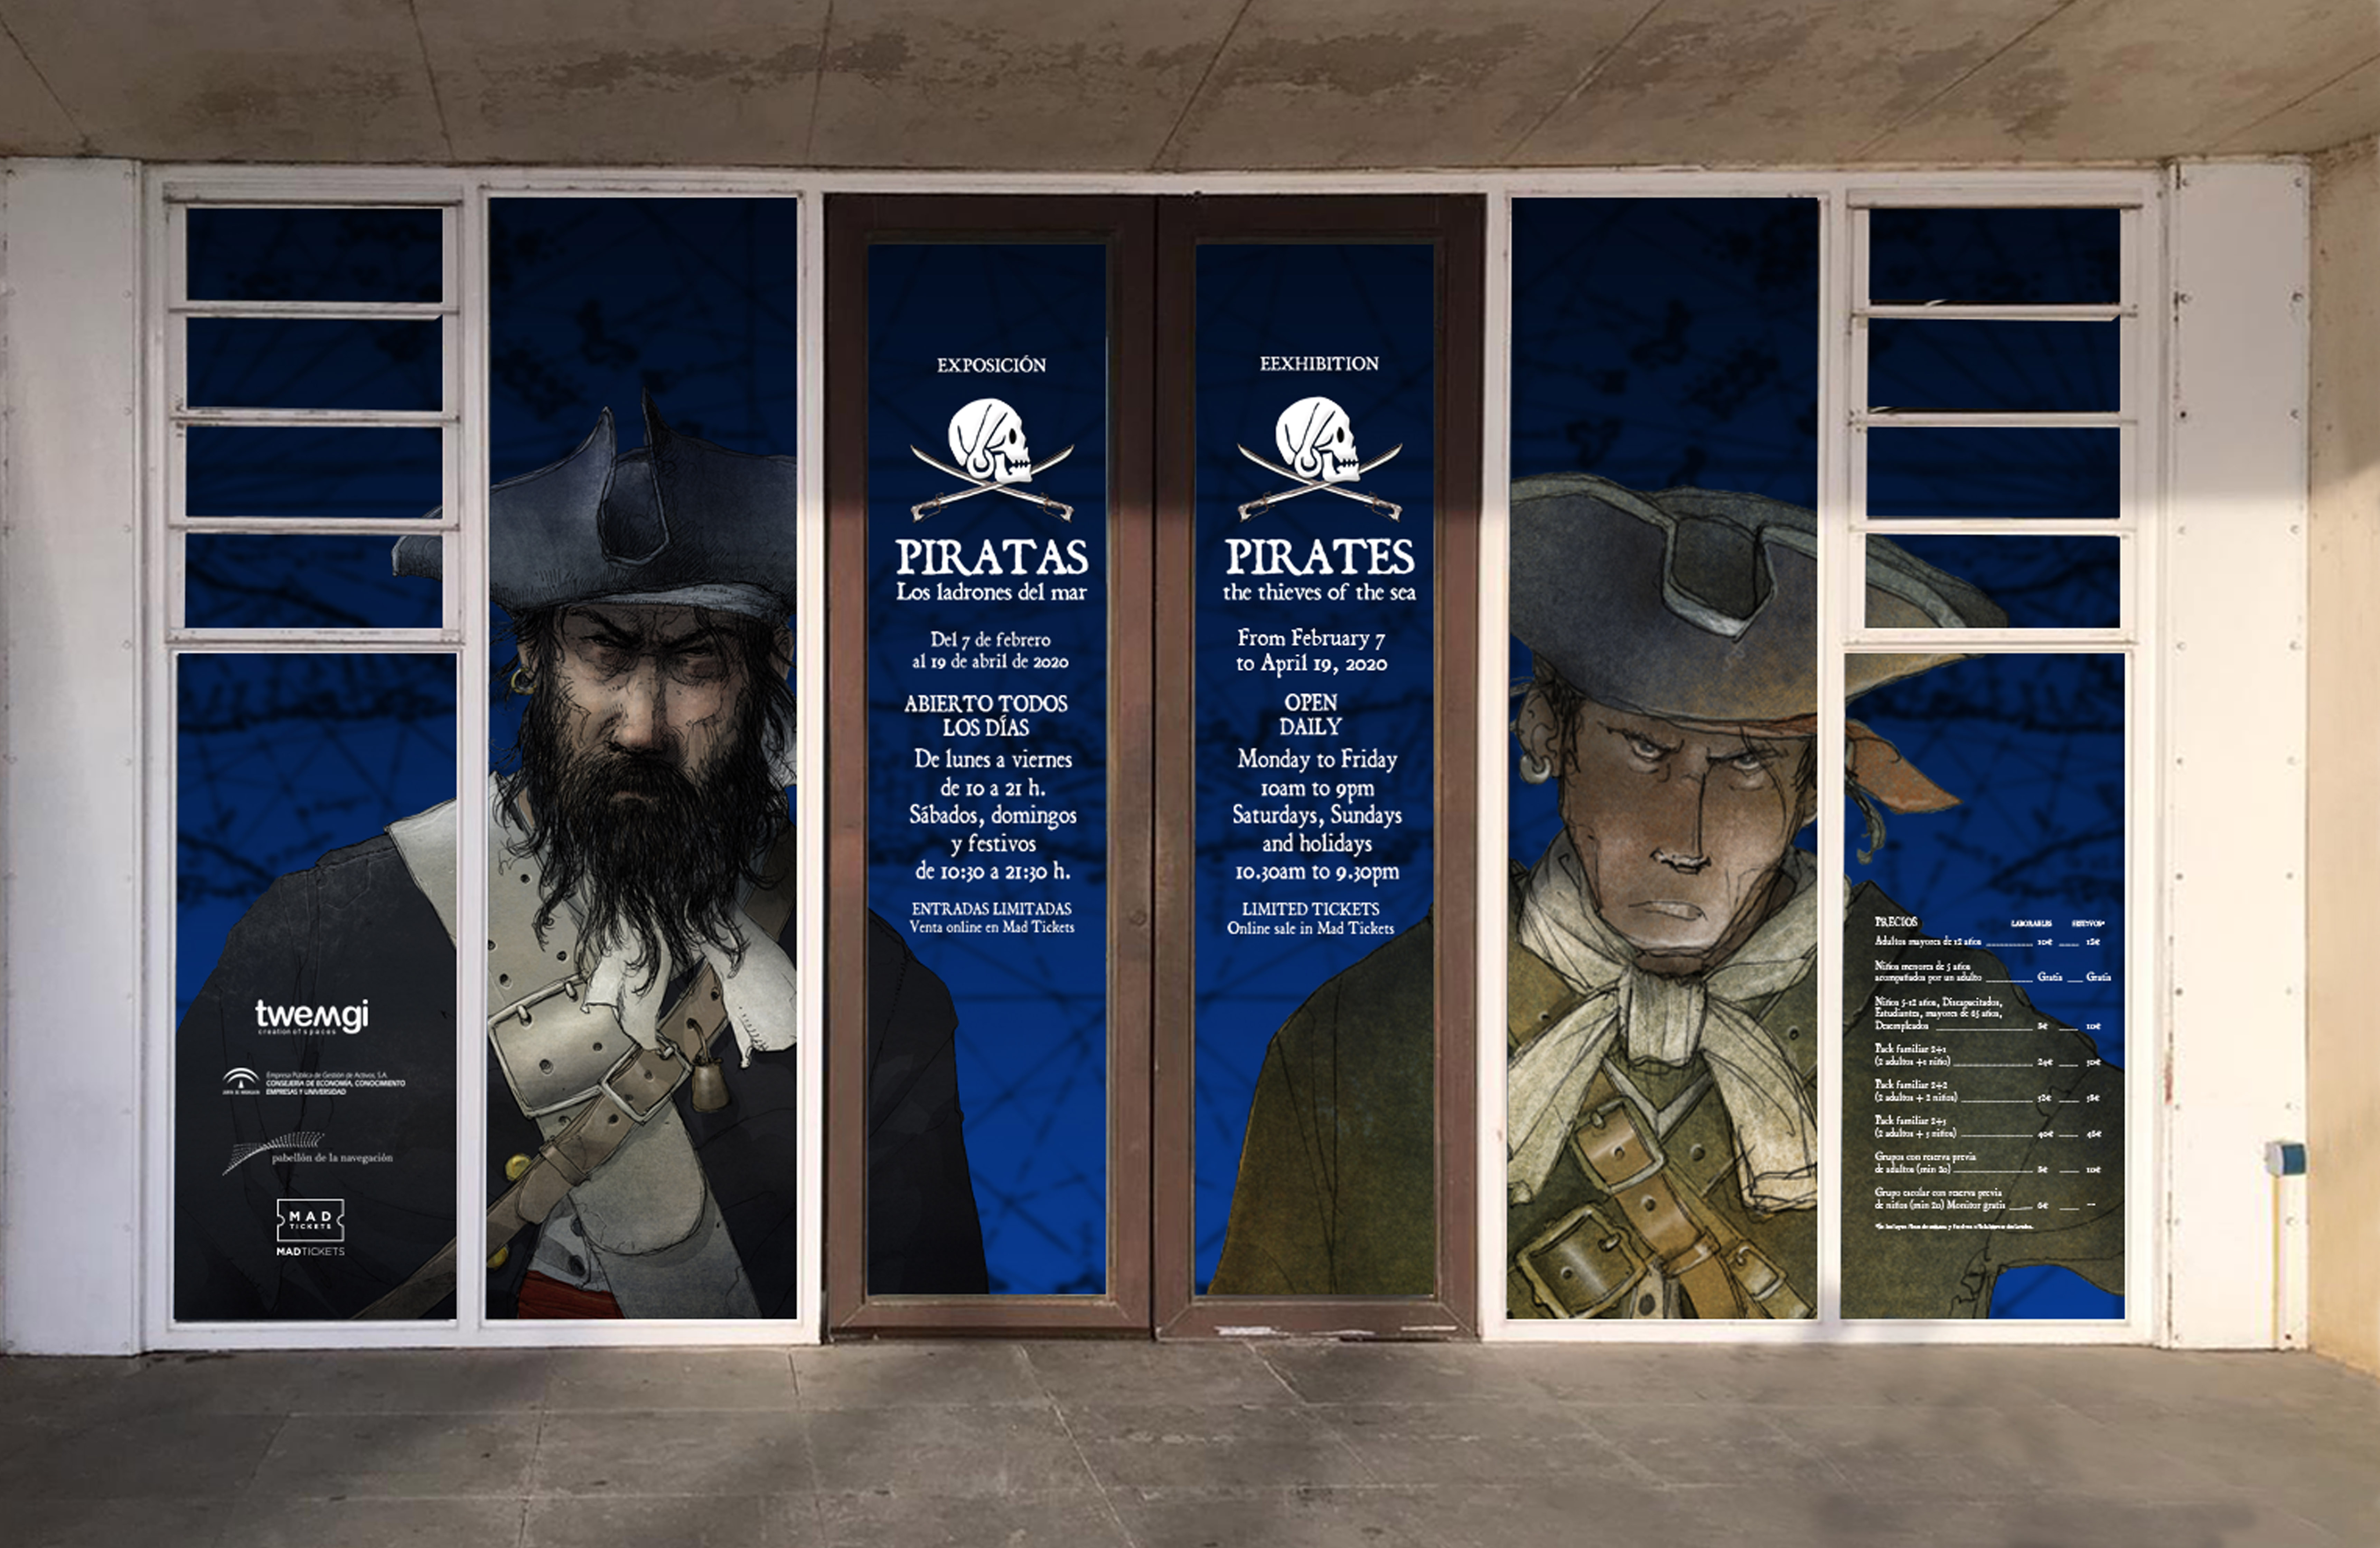 galeria piratas_pantallazo22